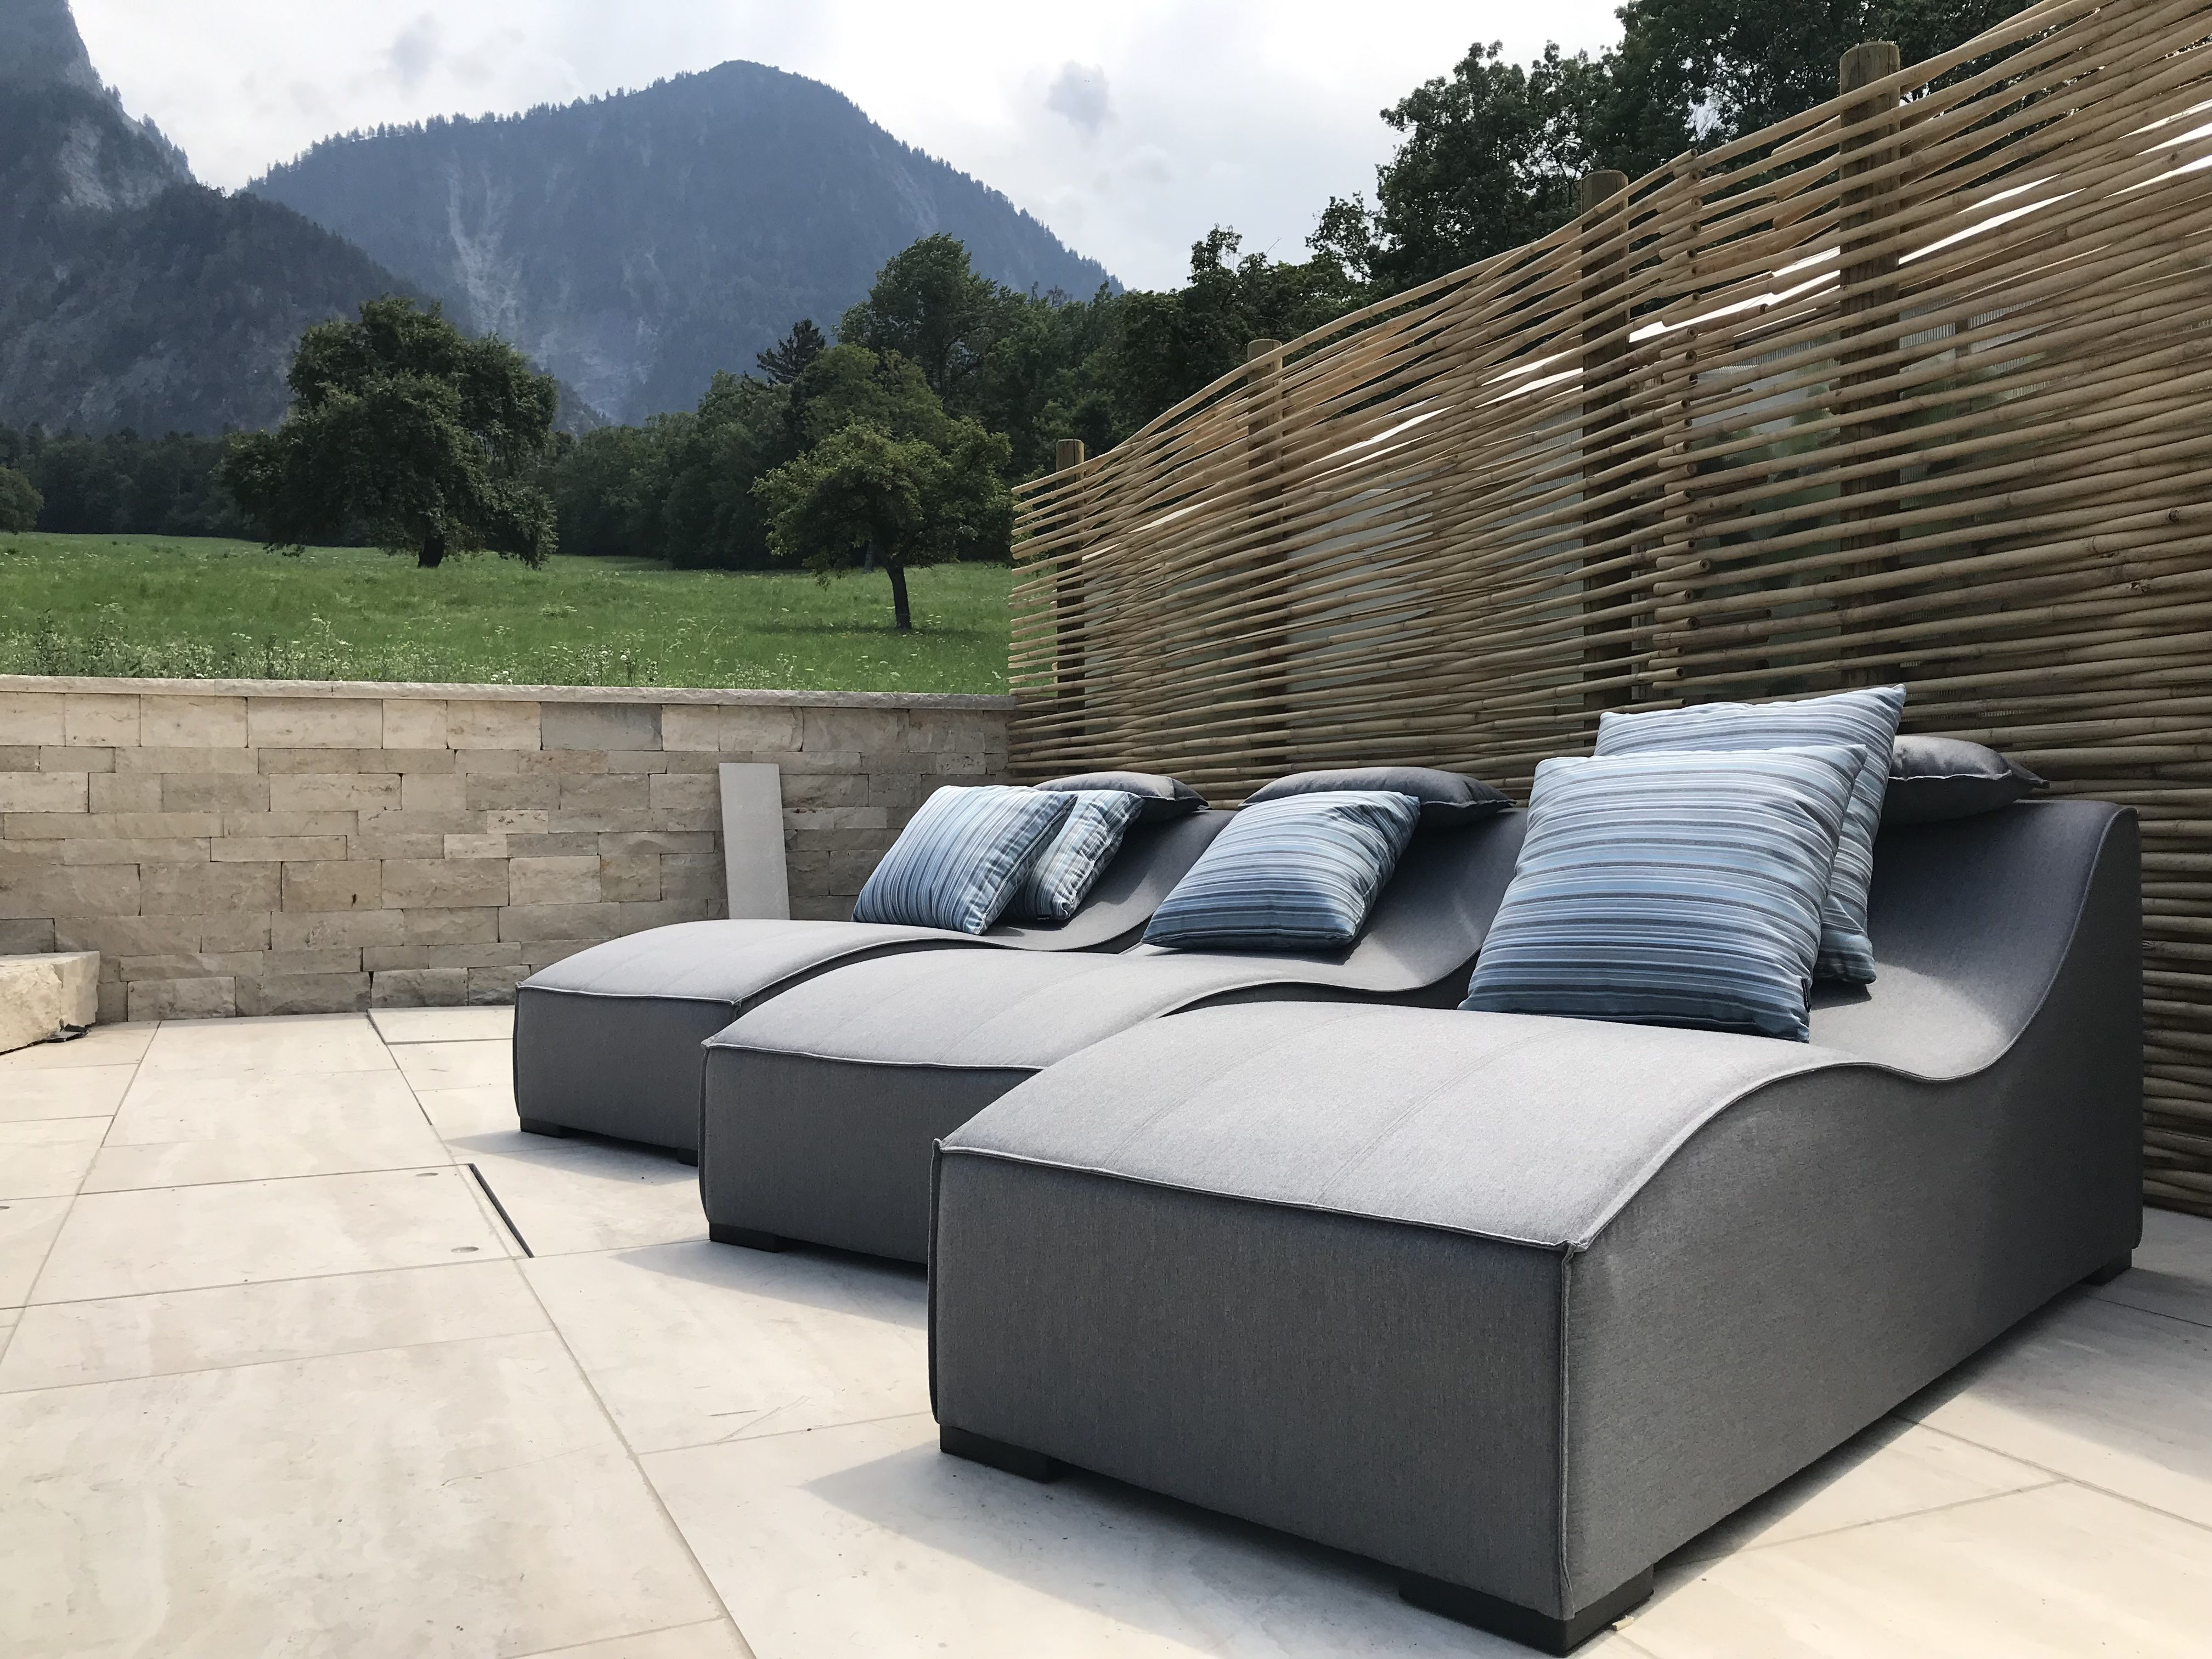 Liegestuhl Sun Grau Kaufen Viplounge Lounge Mobel Outdoor Lounge Liegestuhl